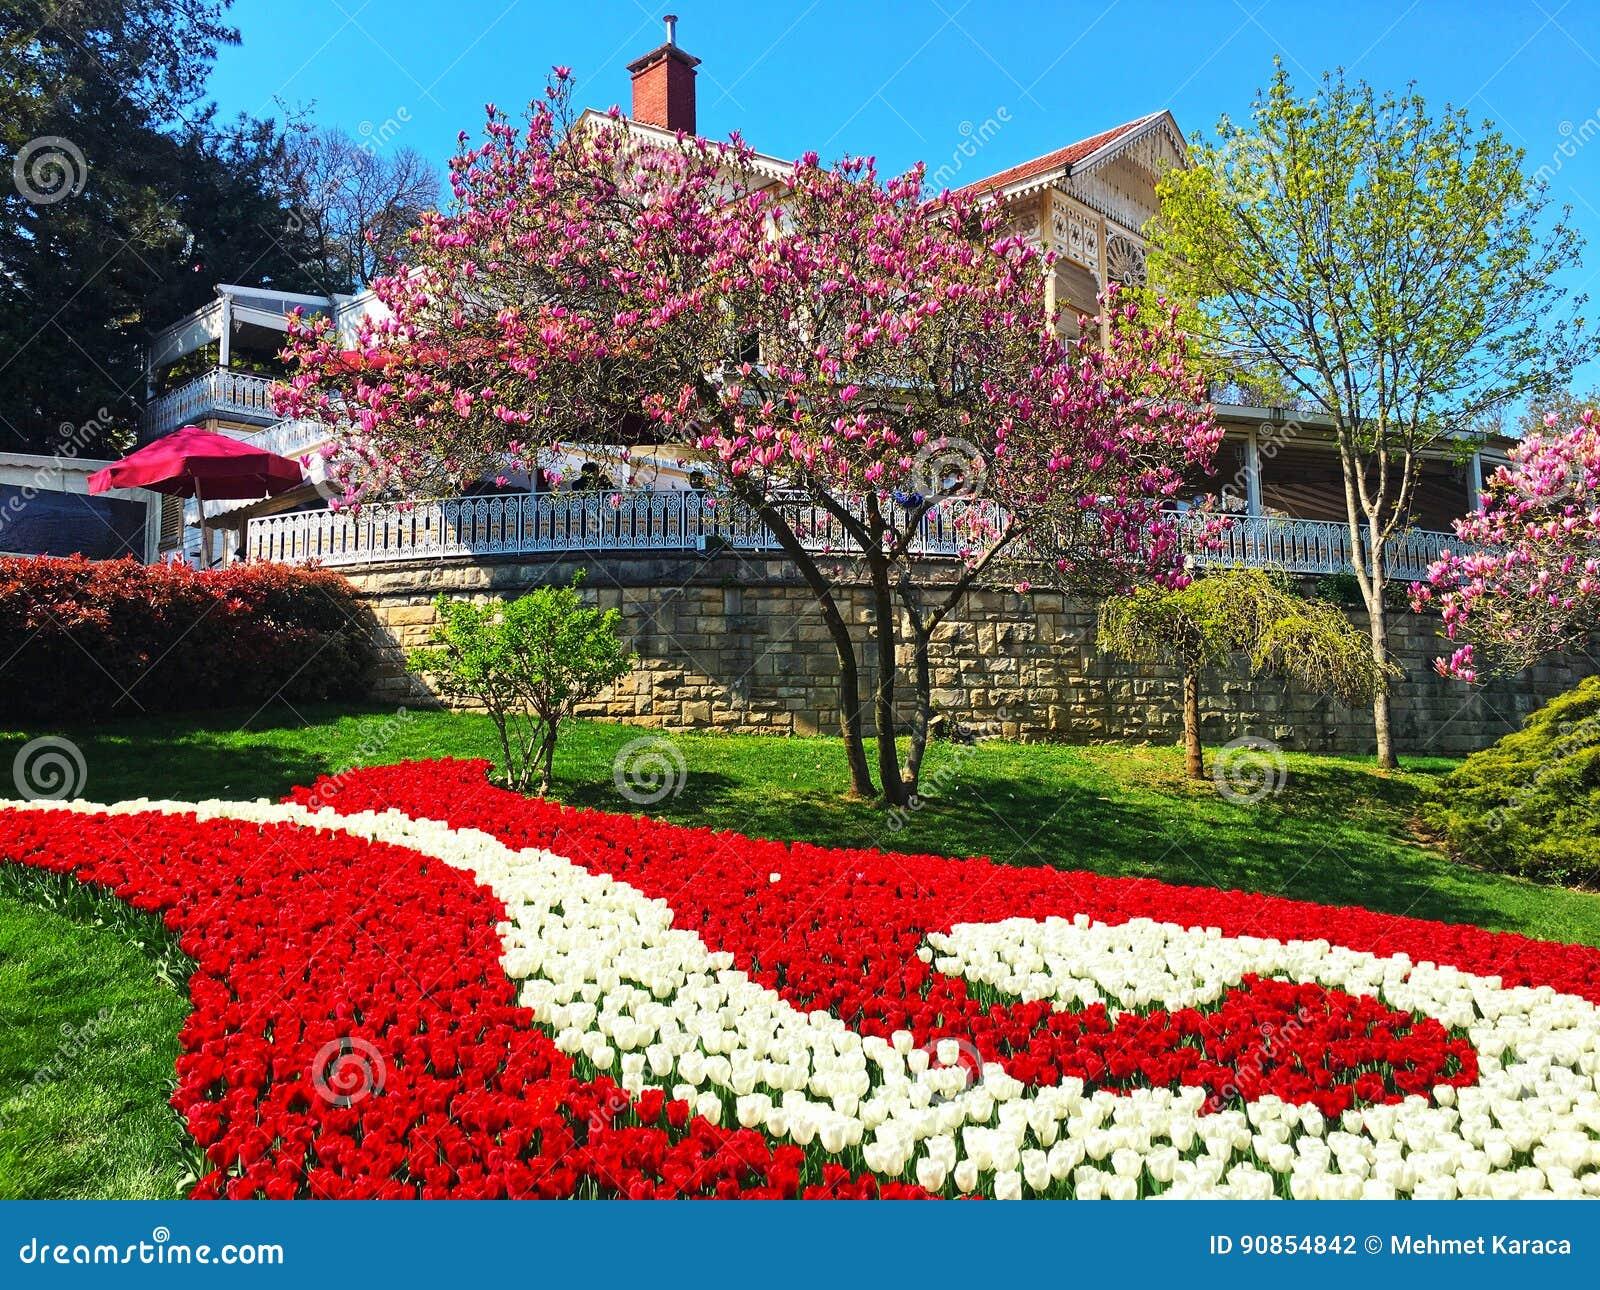 Villa in Garden and Flowers